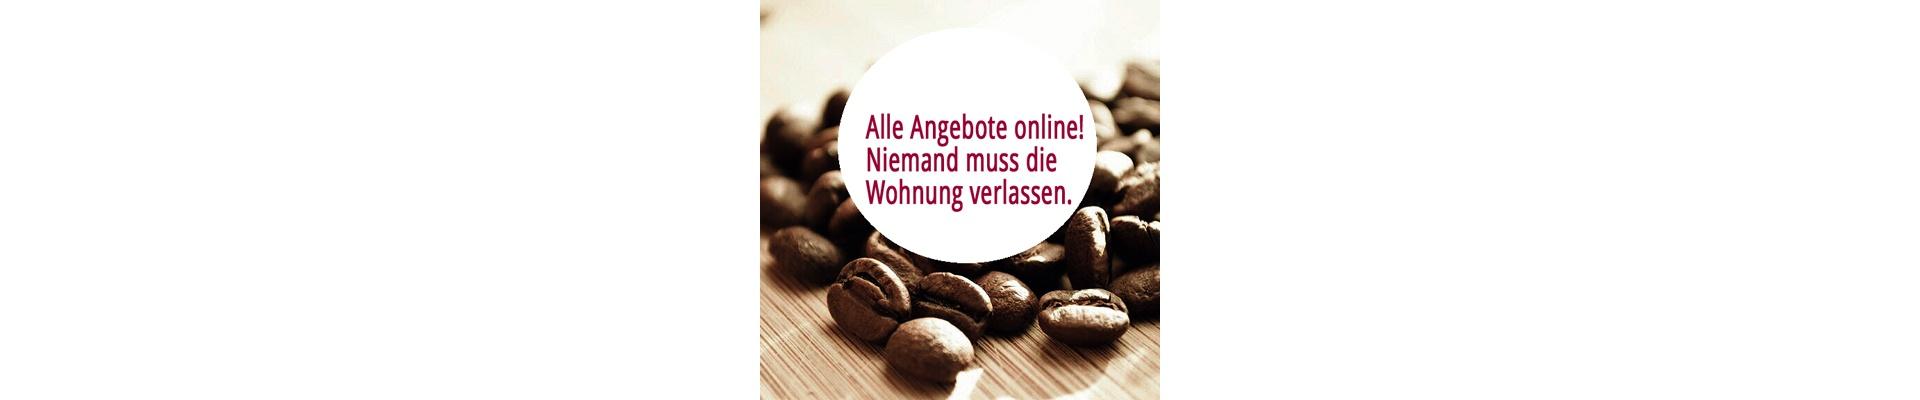 Texterin, Texterin Pulheim, Text Pulheim, Text NRW, Text Rhein-Erft-Kreis